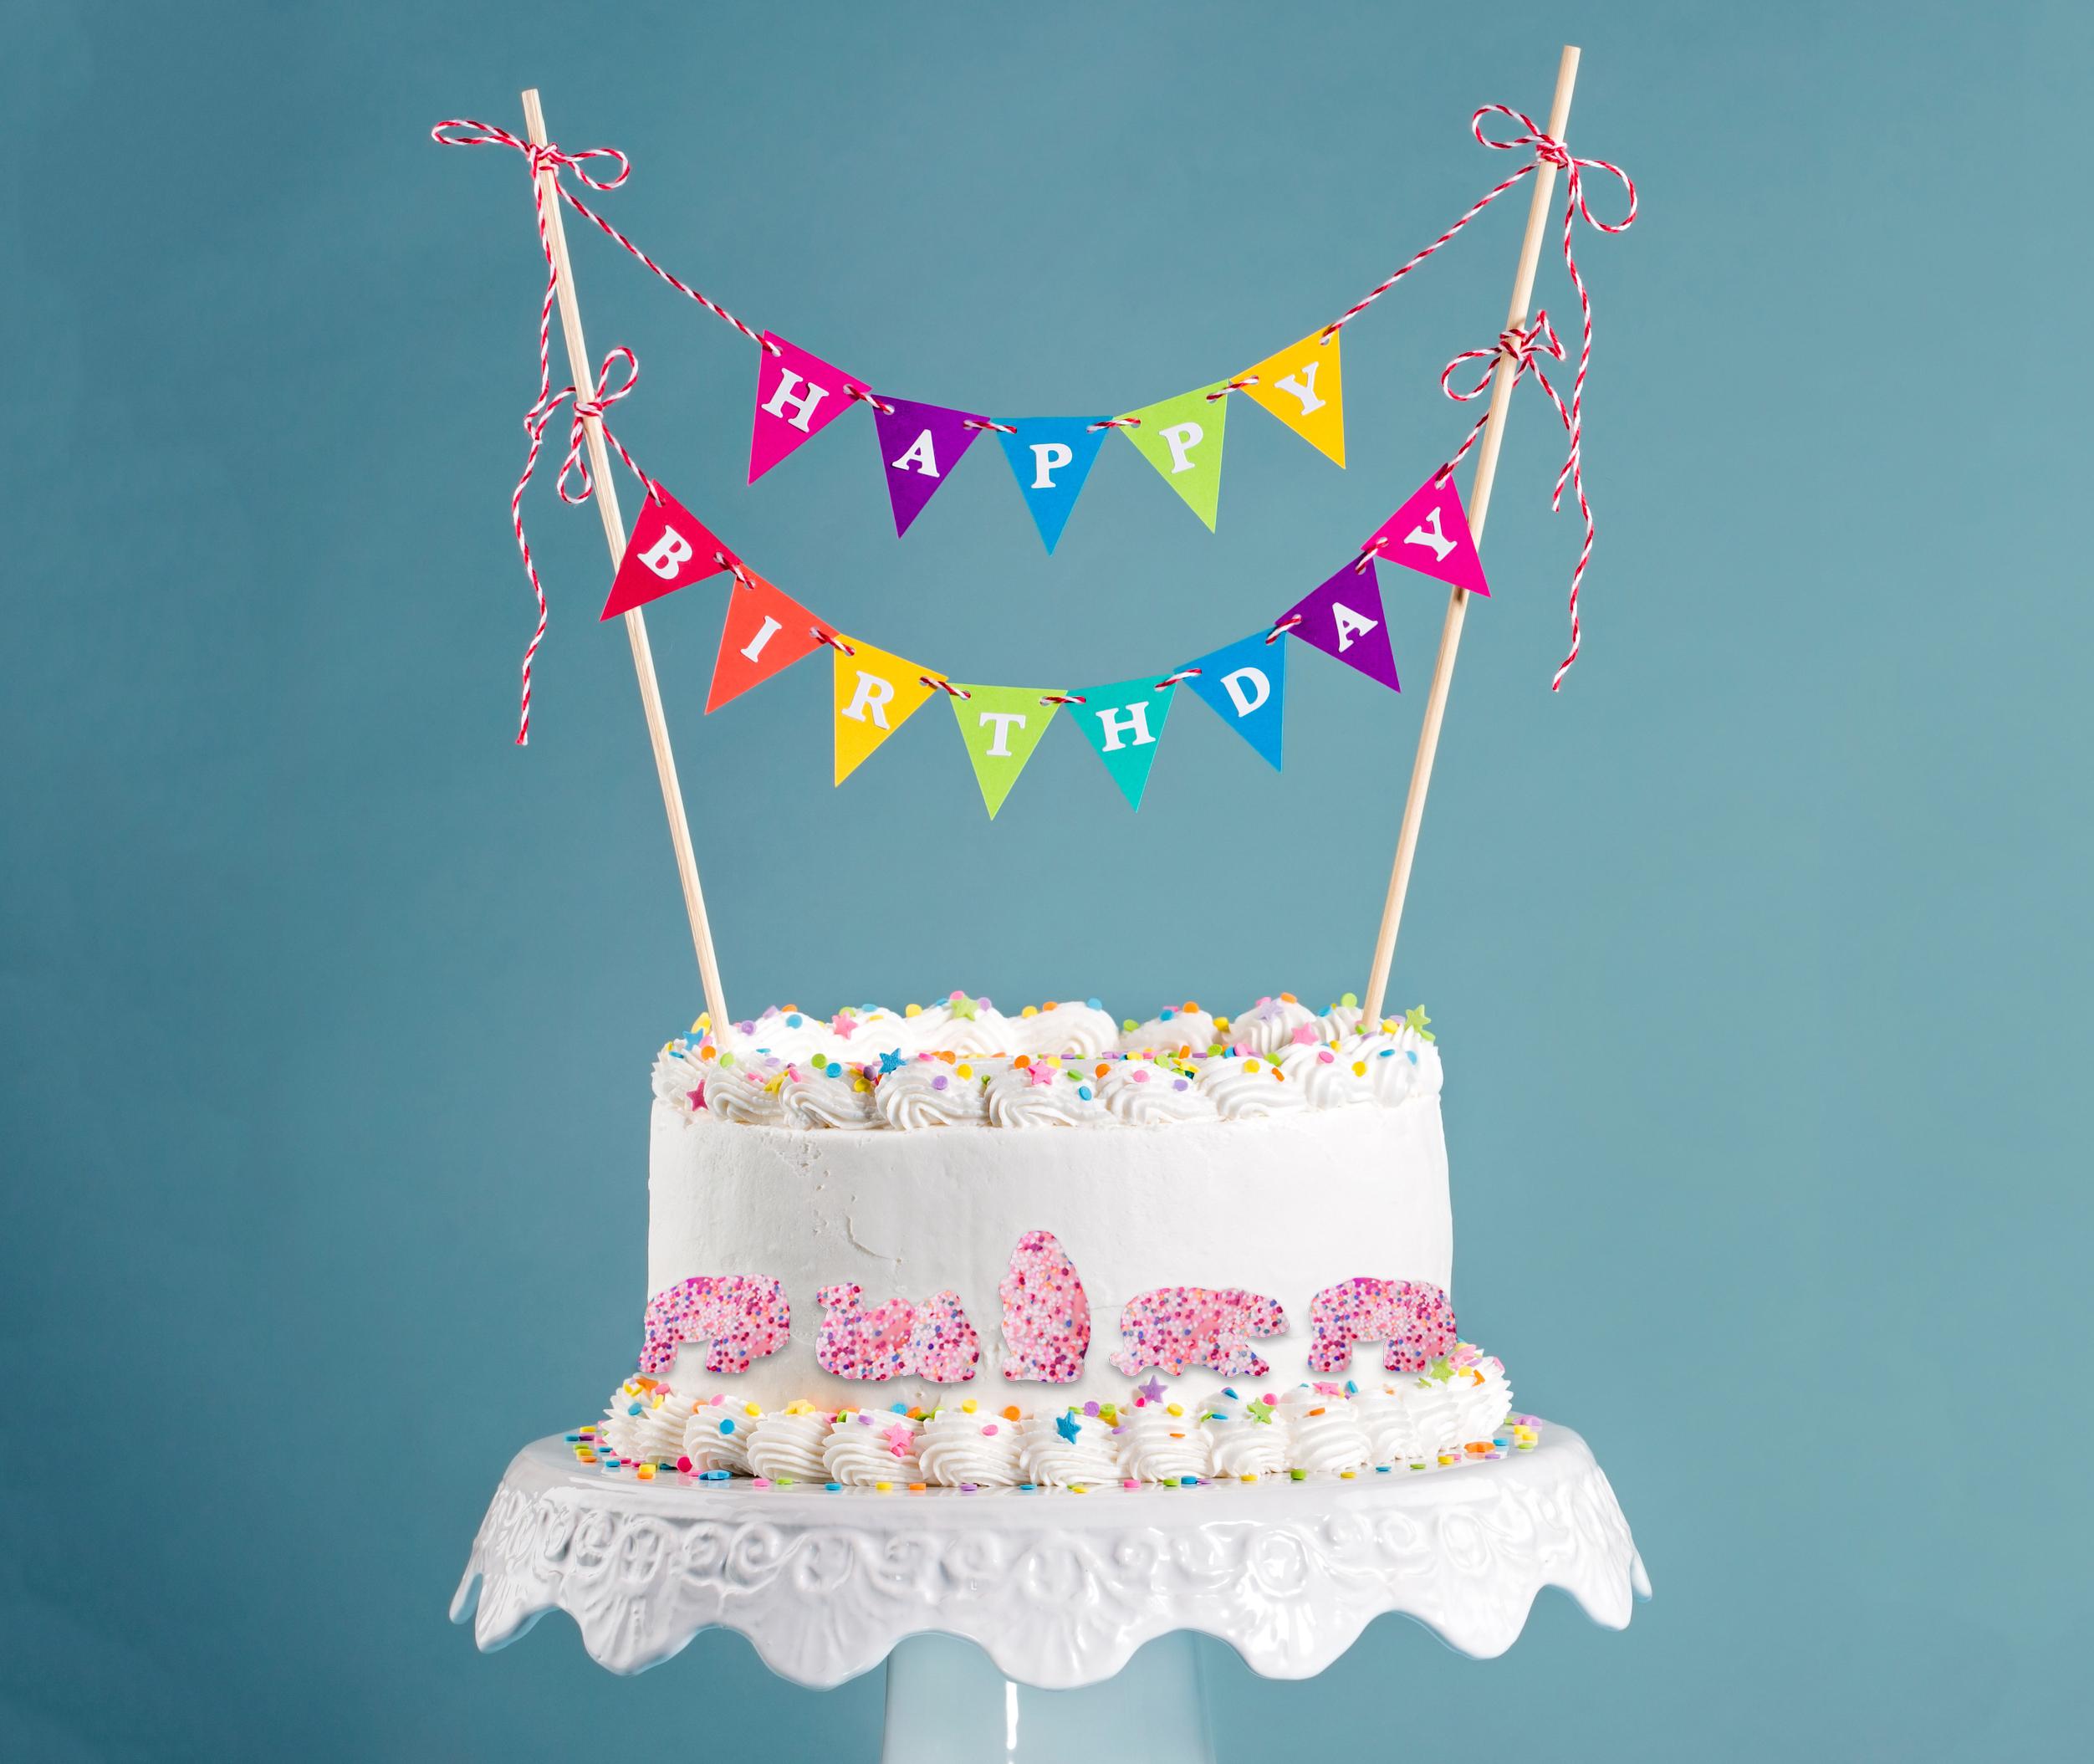 Stupendous Circus Theme Birthday Cake Designs Lovetoknow Funny Birthday Cards Online Elaedamsfinfo